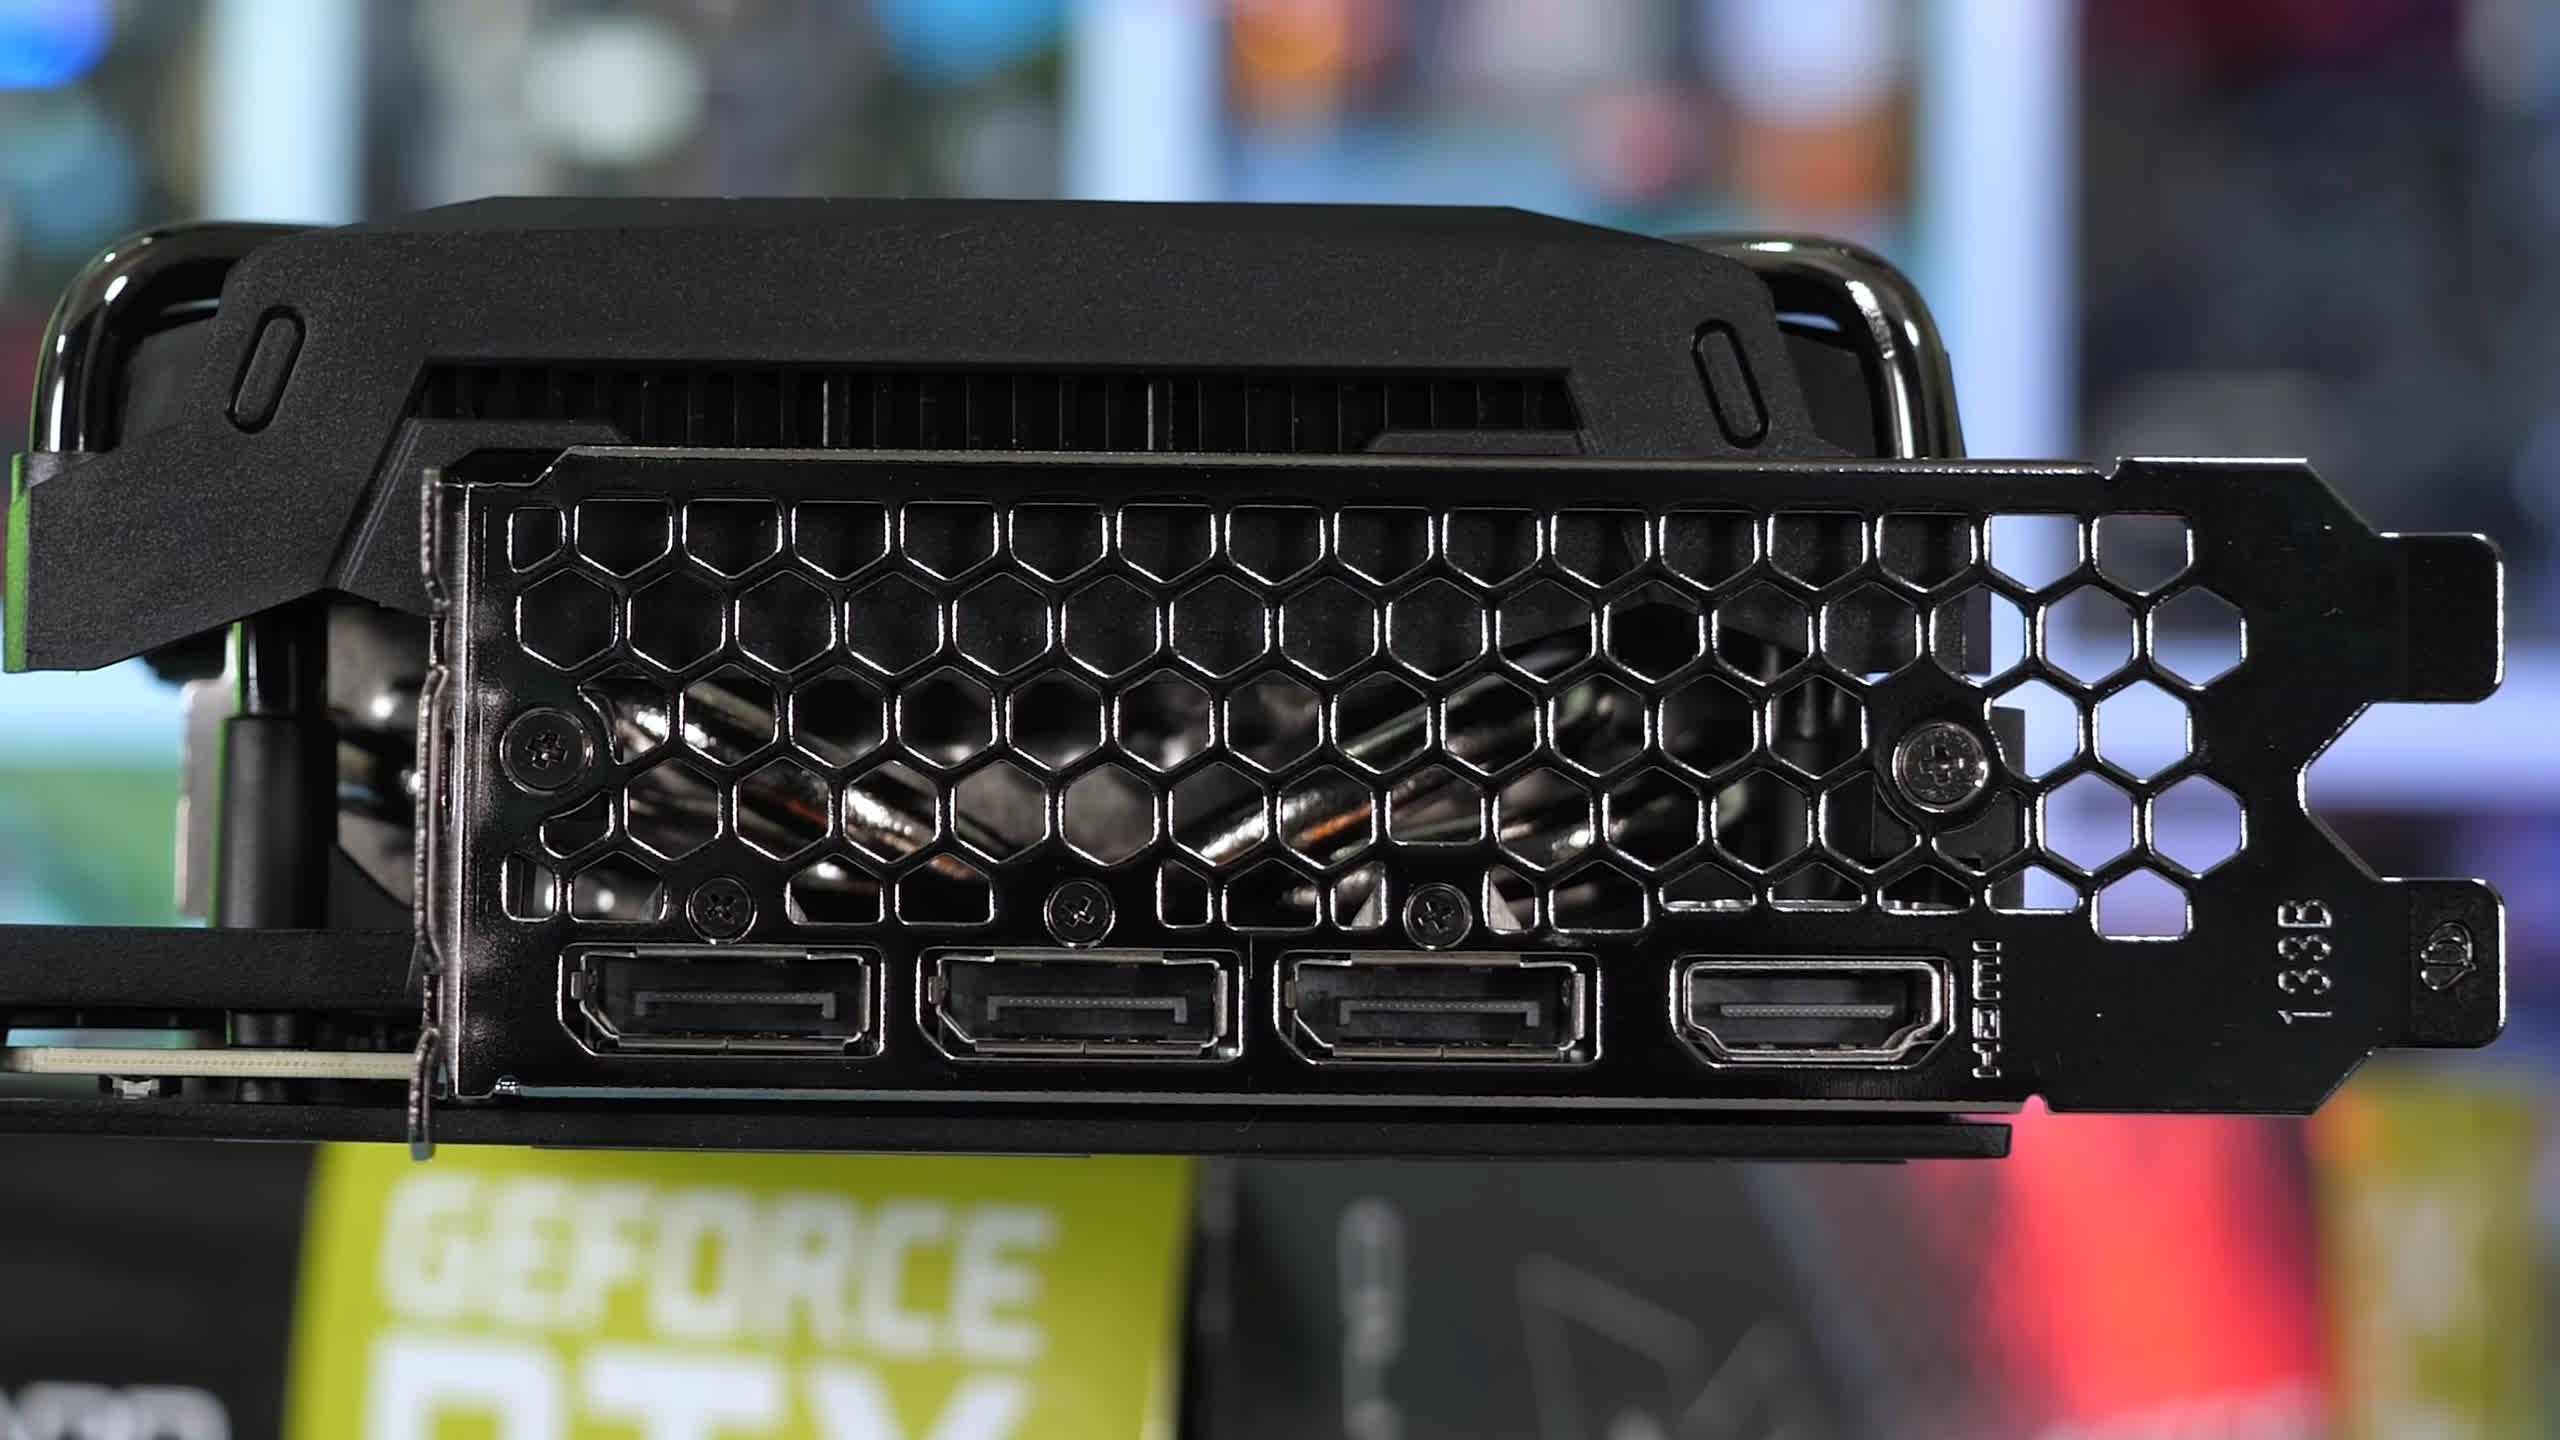 1633605740 108 GeForce RTX 3080 Ti contre Radeon RX 6800 XT